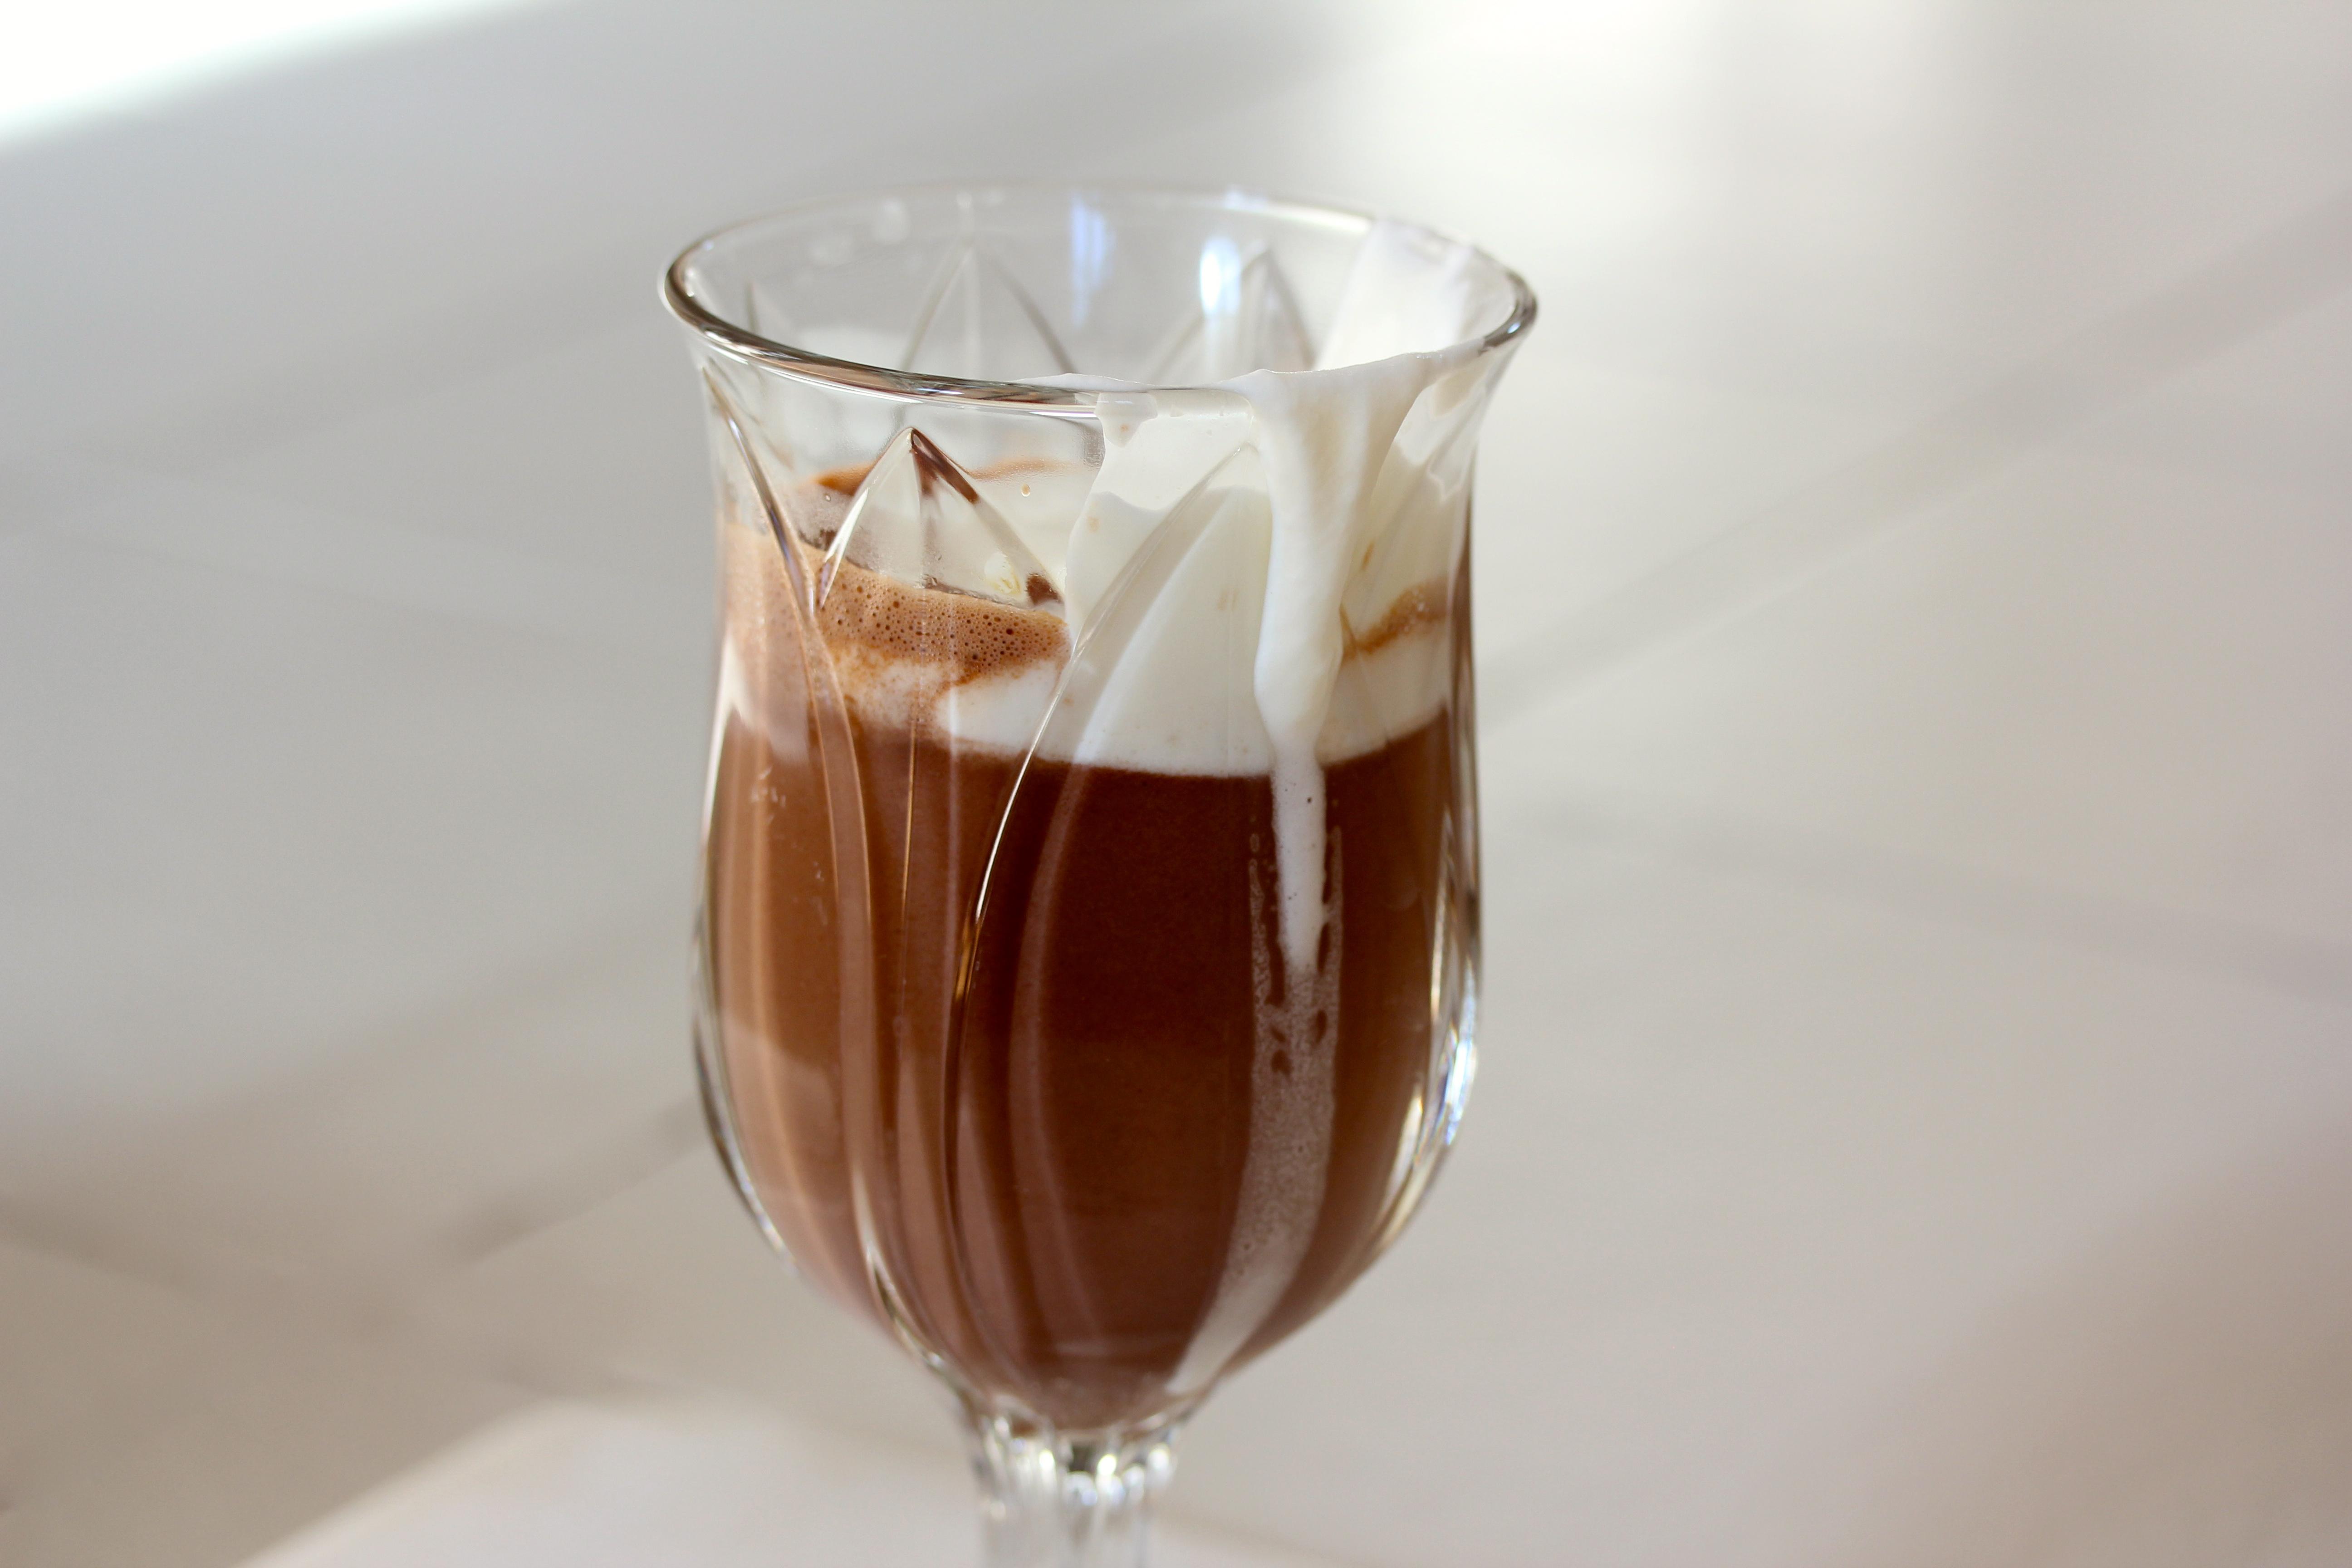 Le chocolat chaud {with a twist} - Saffron and Honey